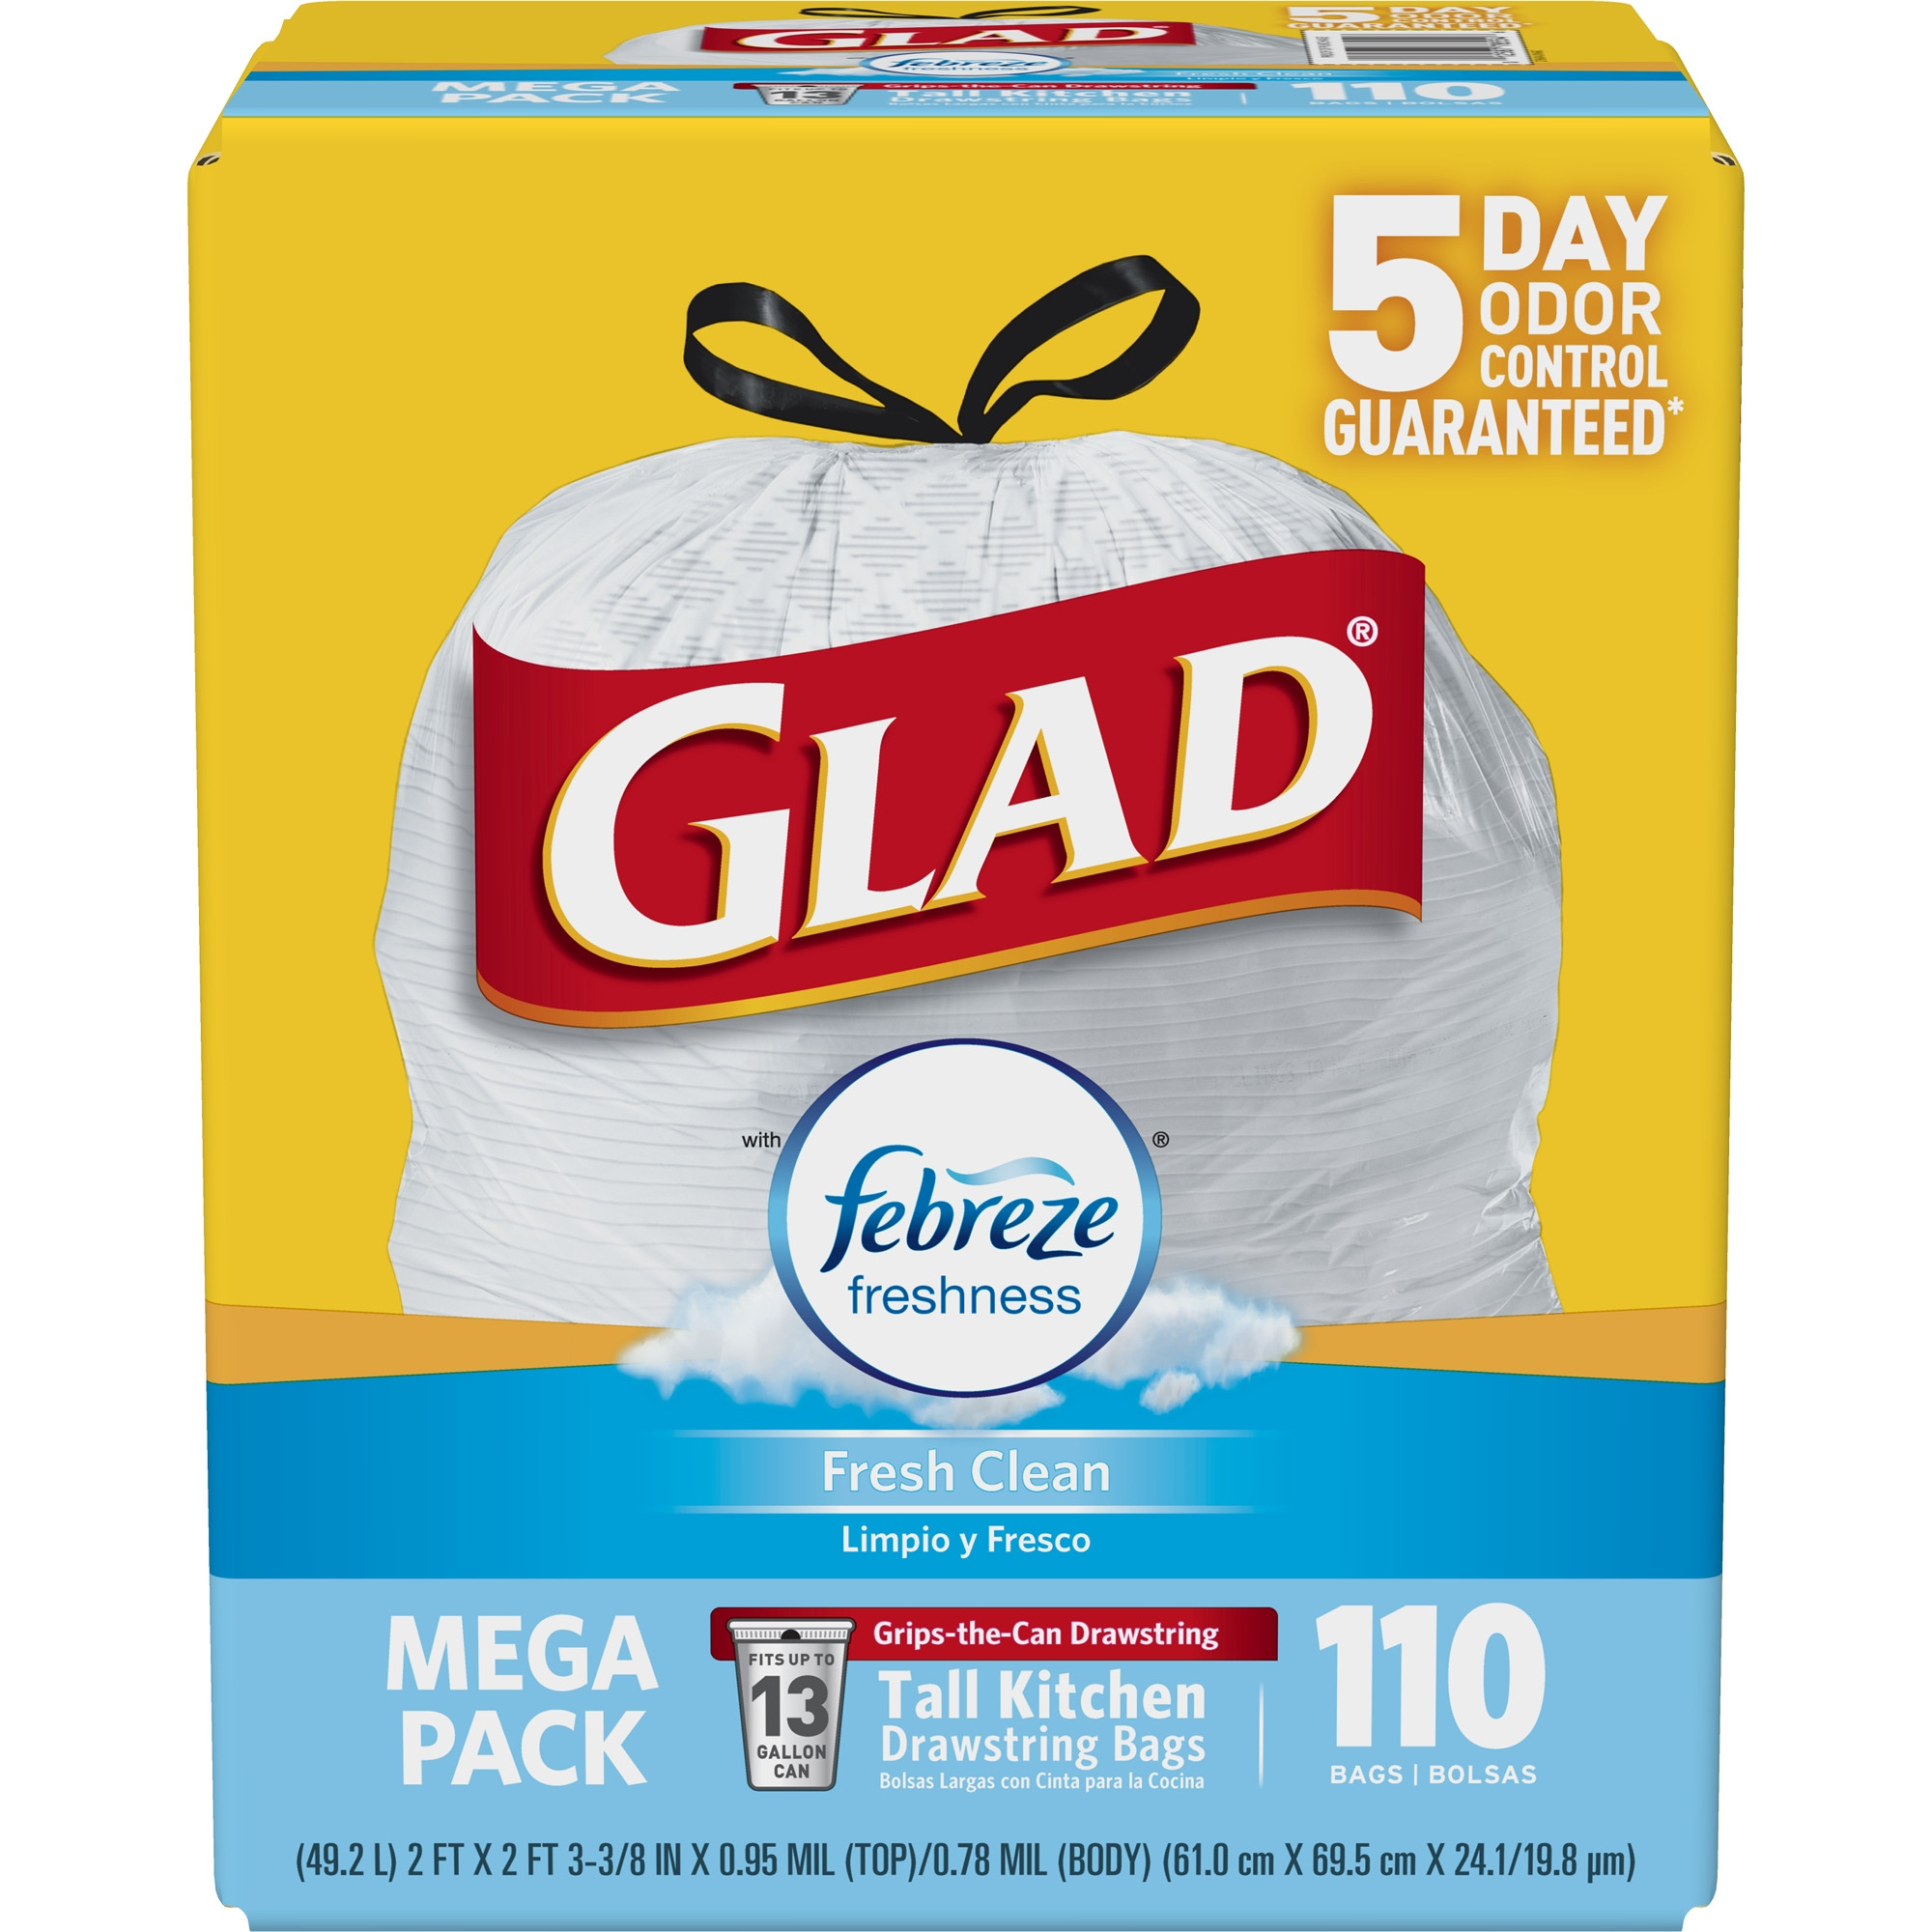 Glad OdorShield Tall Kitchen Drawstring Trash Bags Febreze Fresh Clean 13 Gallon 110 Count Walmart